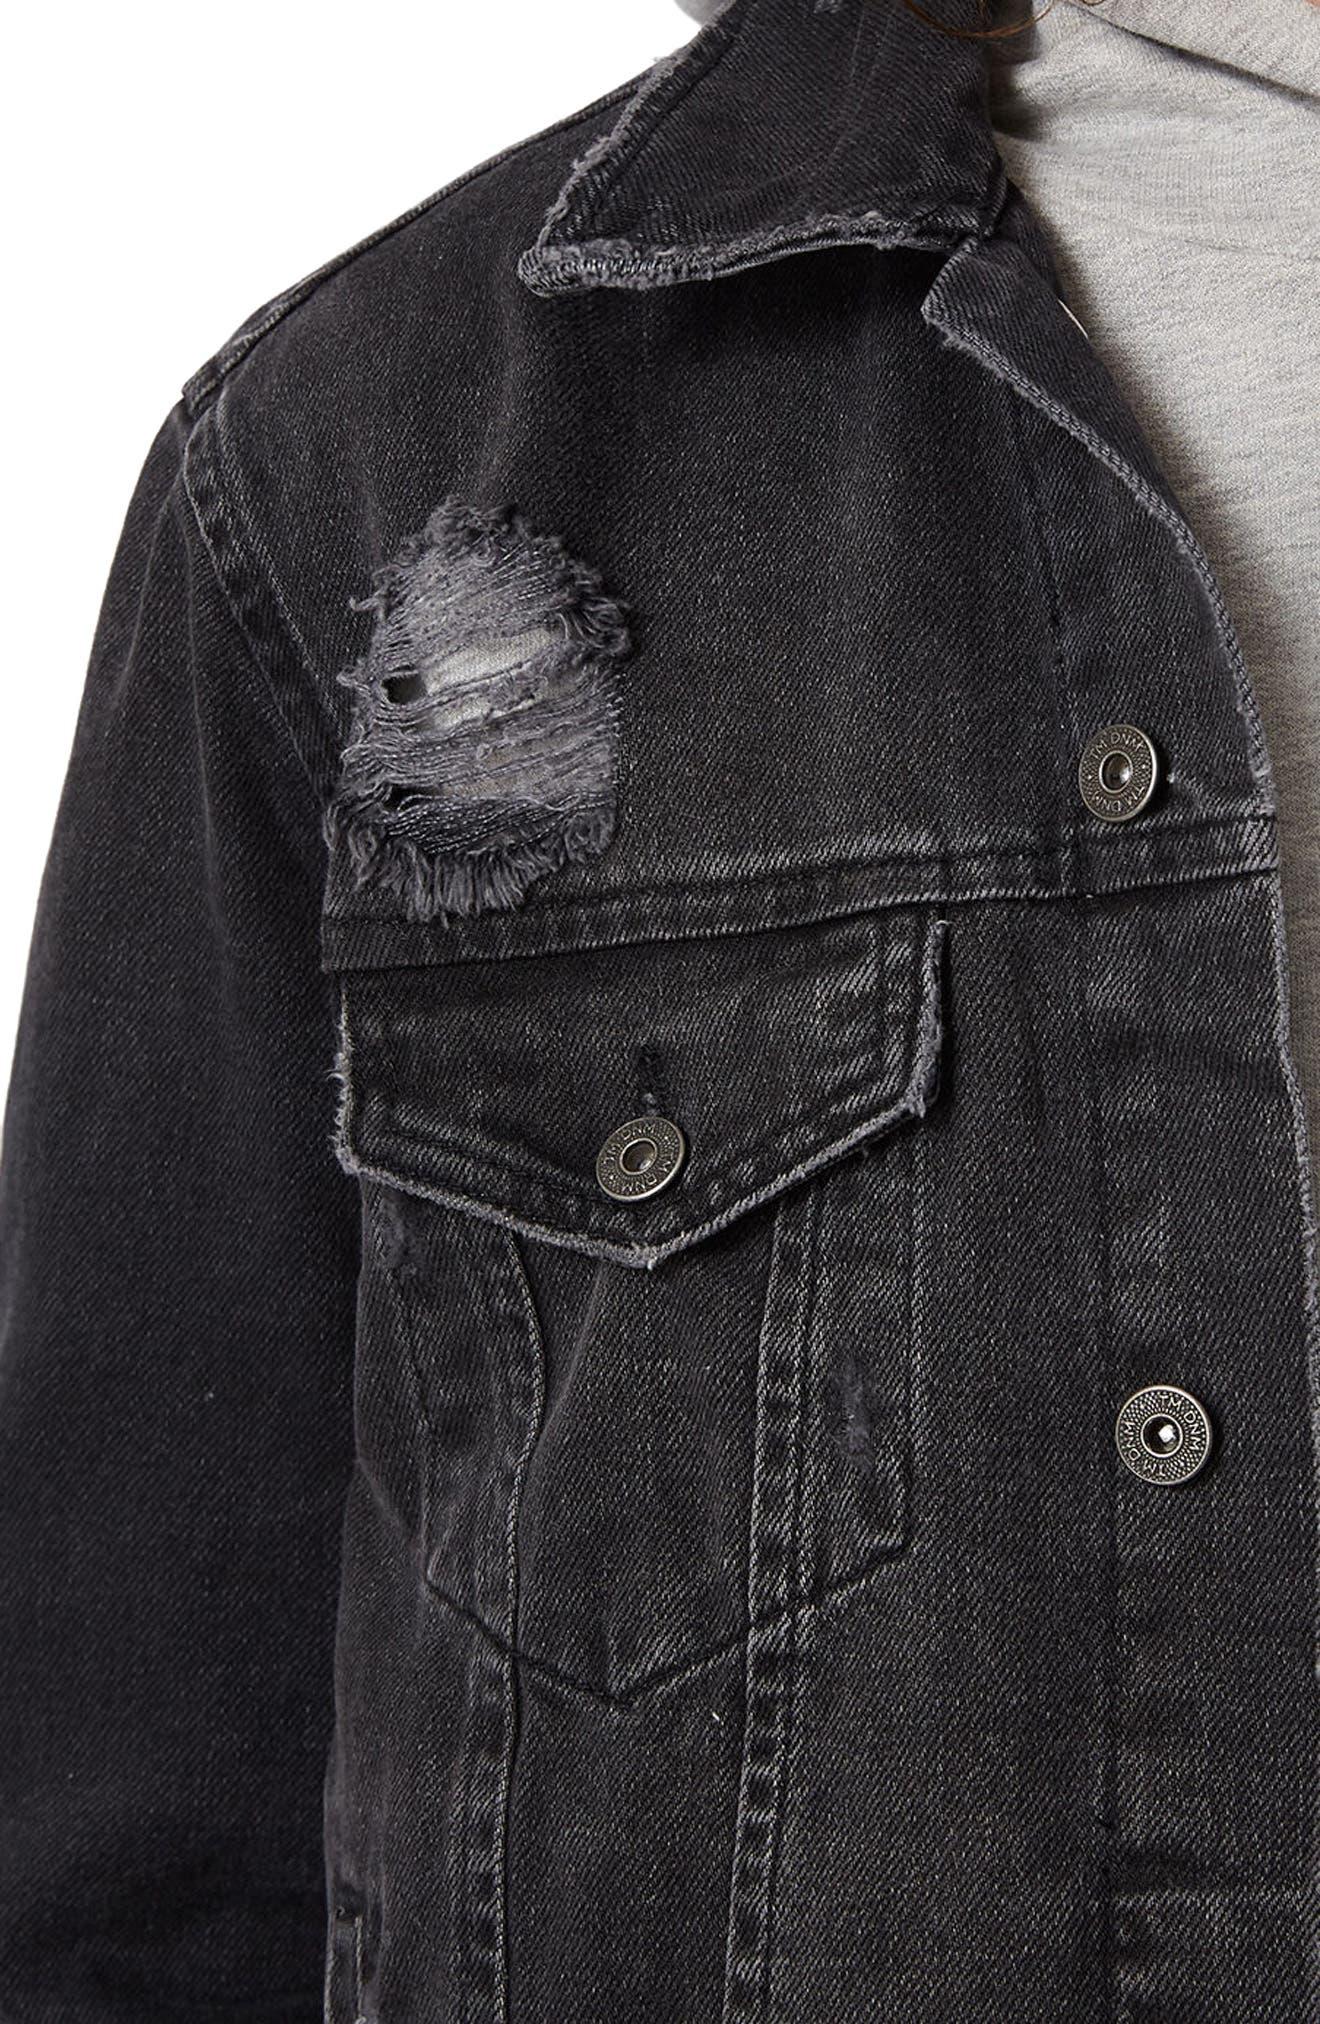 Distressed Denim Jacket,                             Alternate thumbnail 4, color,                             001